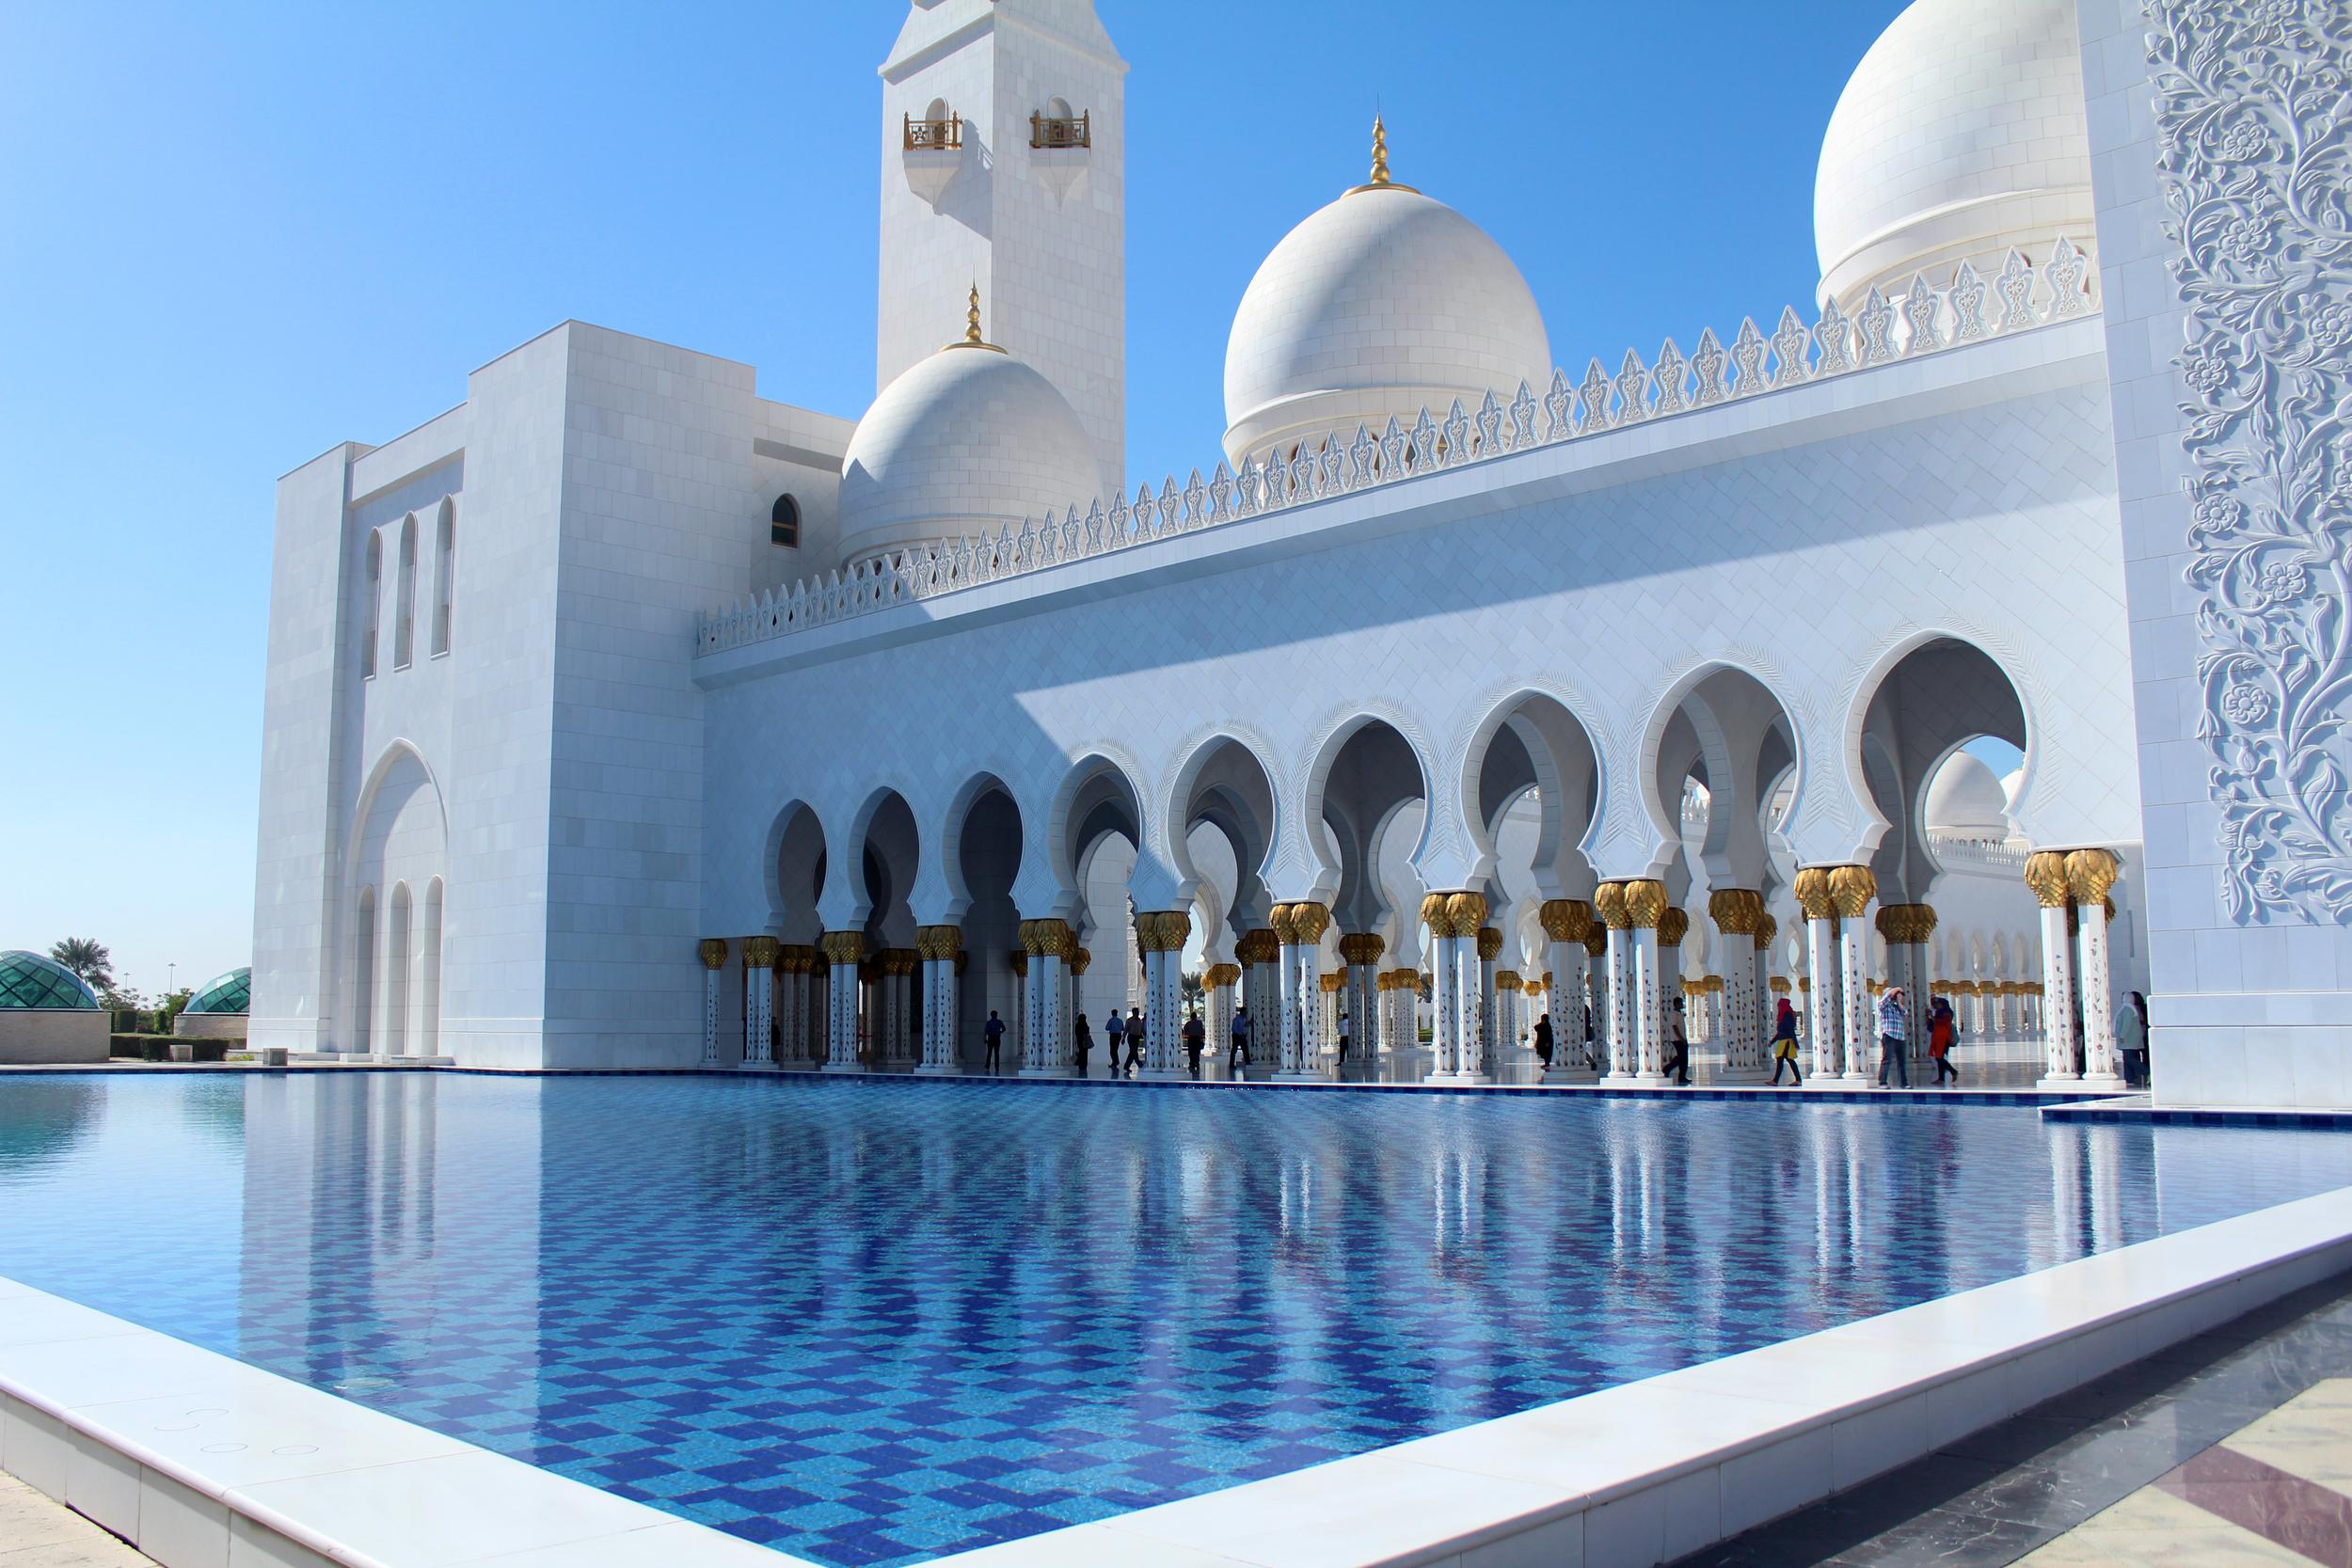 Grand Mosque, Abu Dhabi, United Arab Emirates.